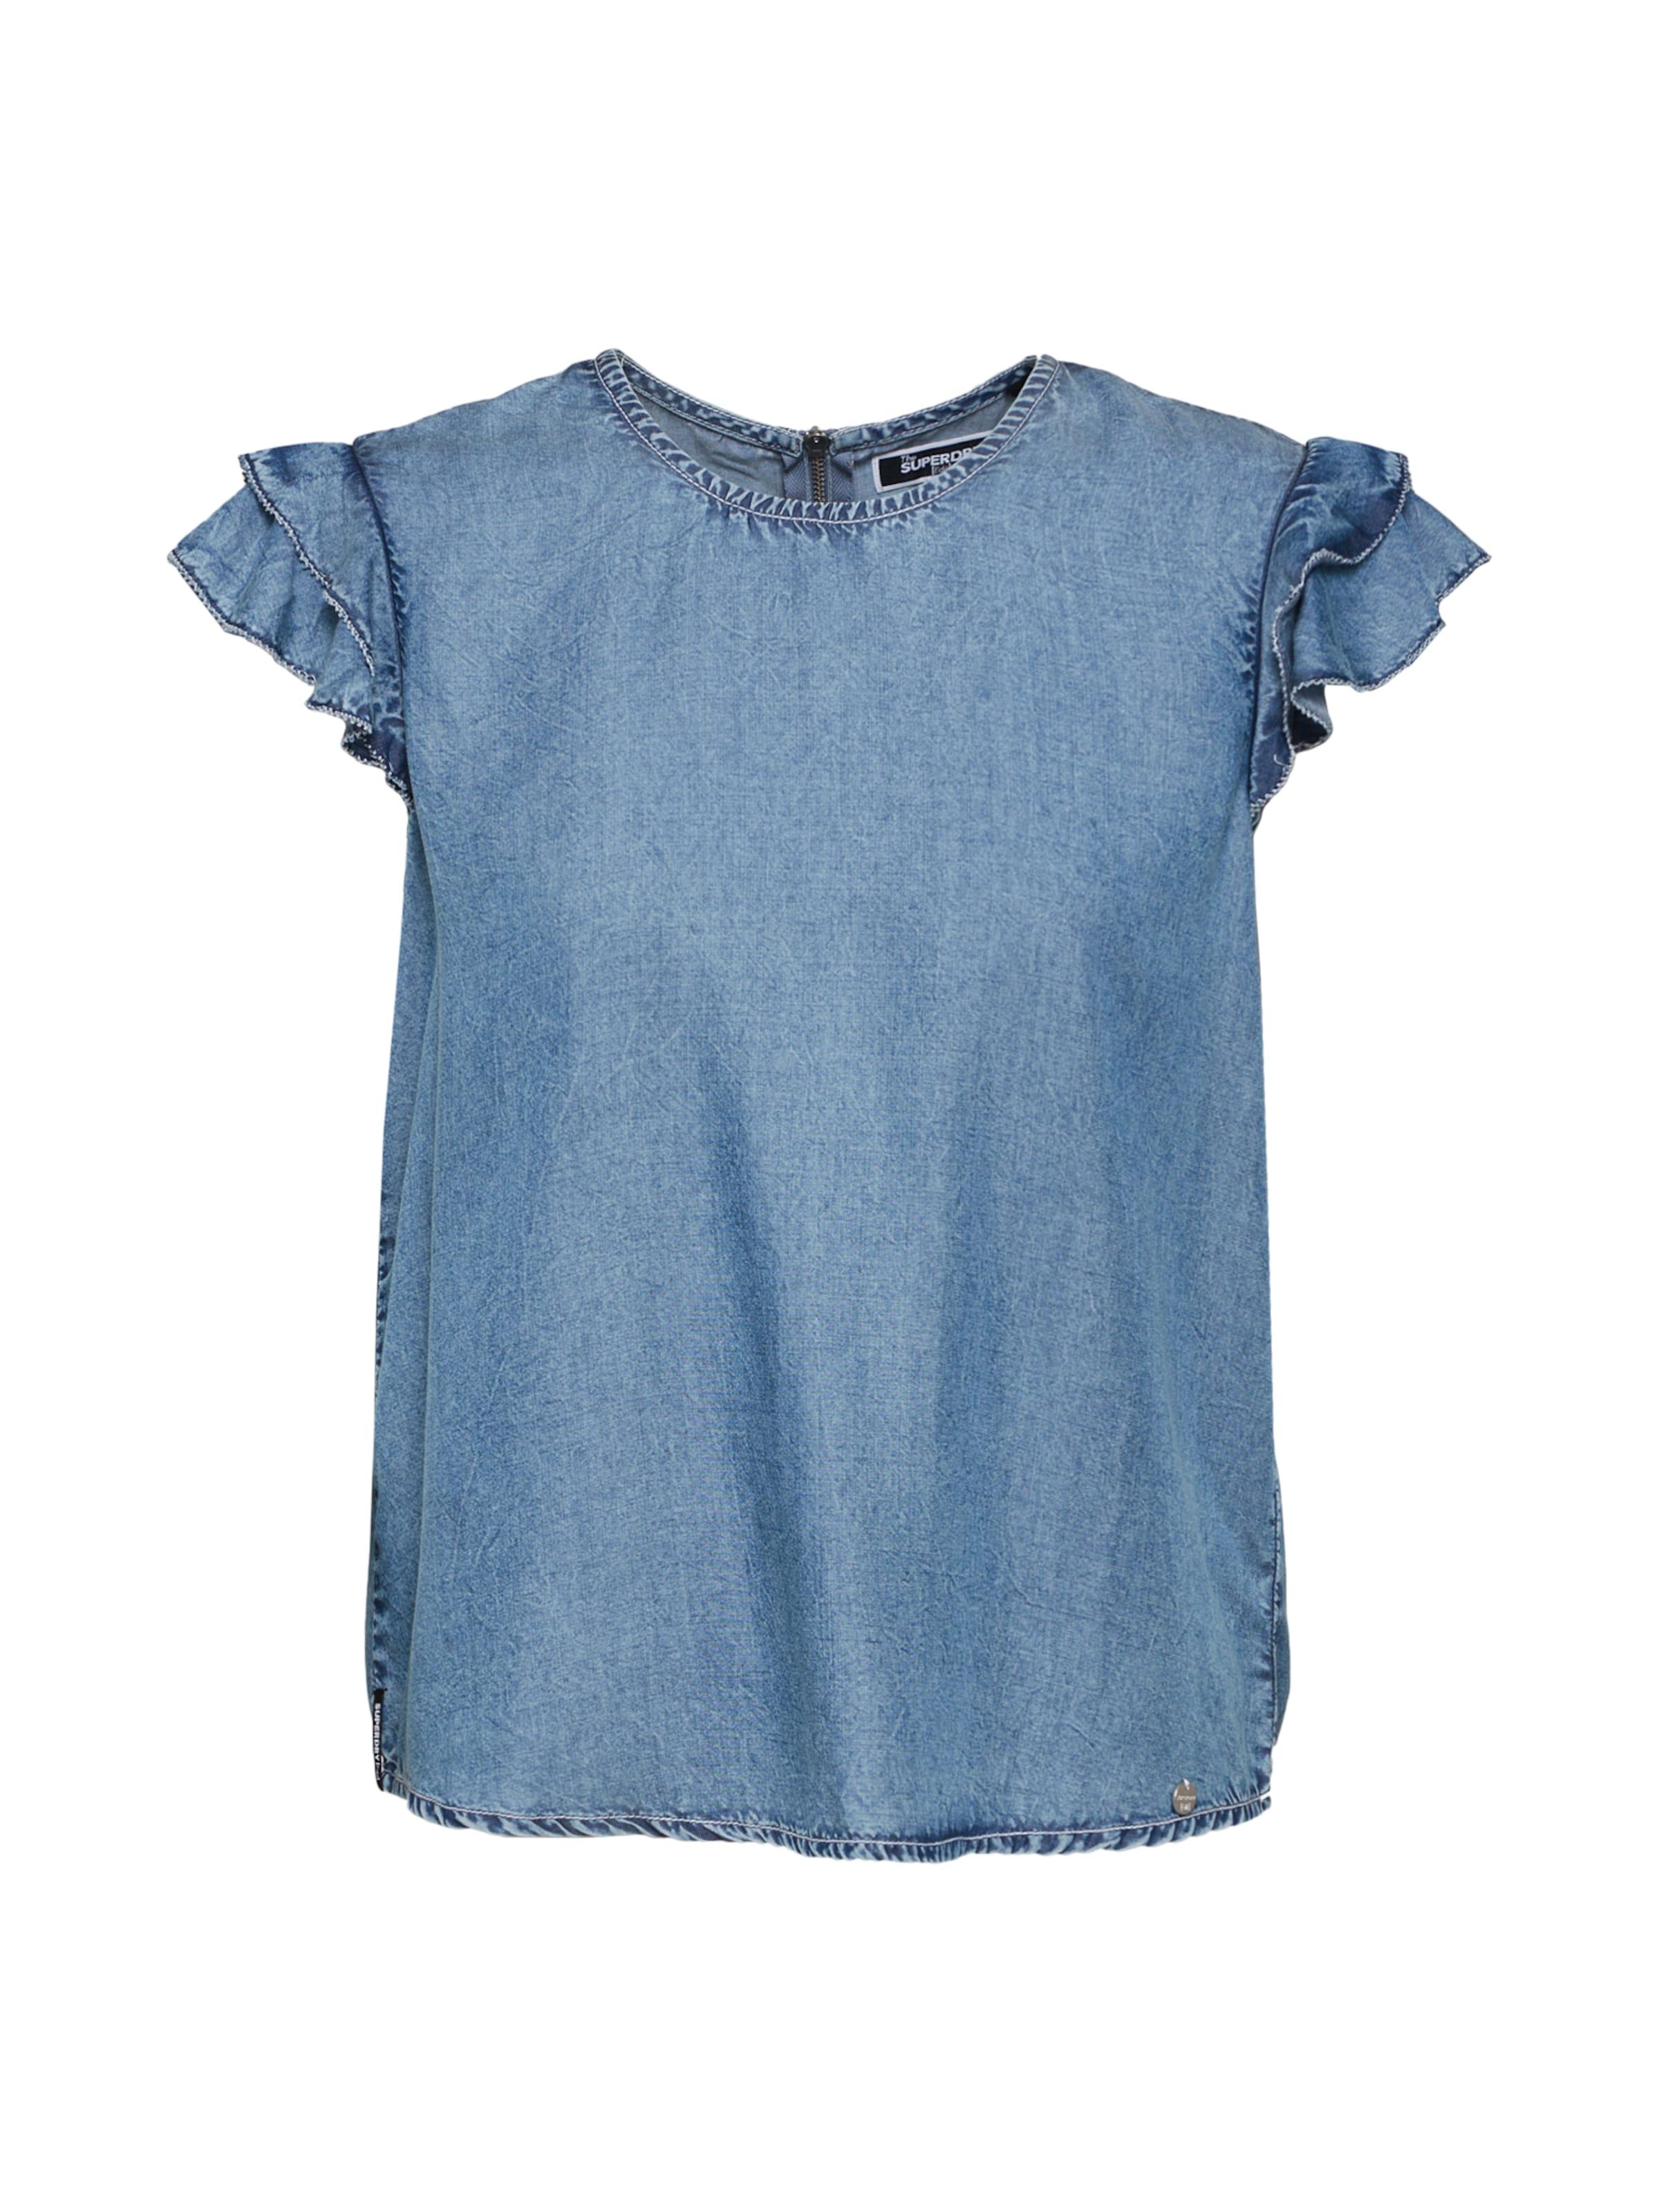 Bluse Bluse In Superdry In Blau Blau Blau Superdry Superdry Bluse In In Bluse Superdry OX0kNZPw8n